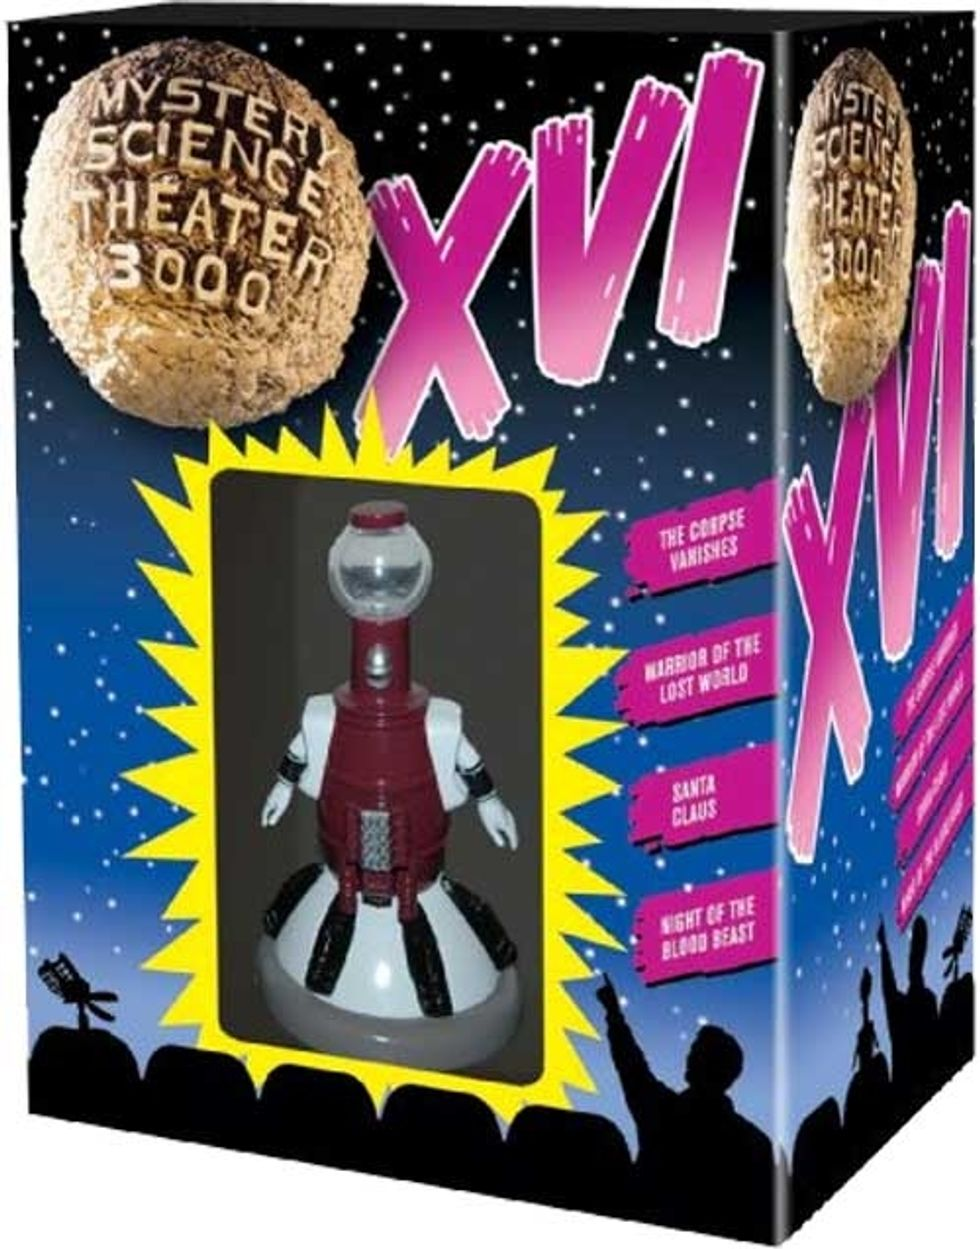 Mystery Science Theater 3000: Volume XVI On DVD!